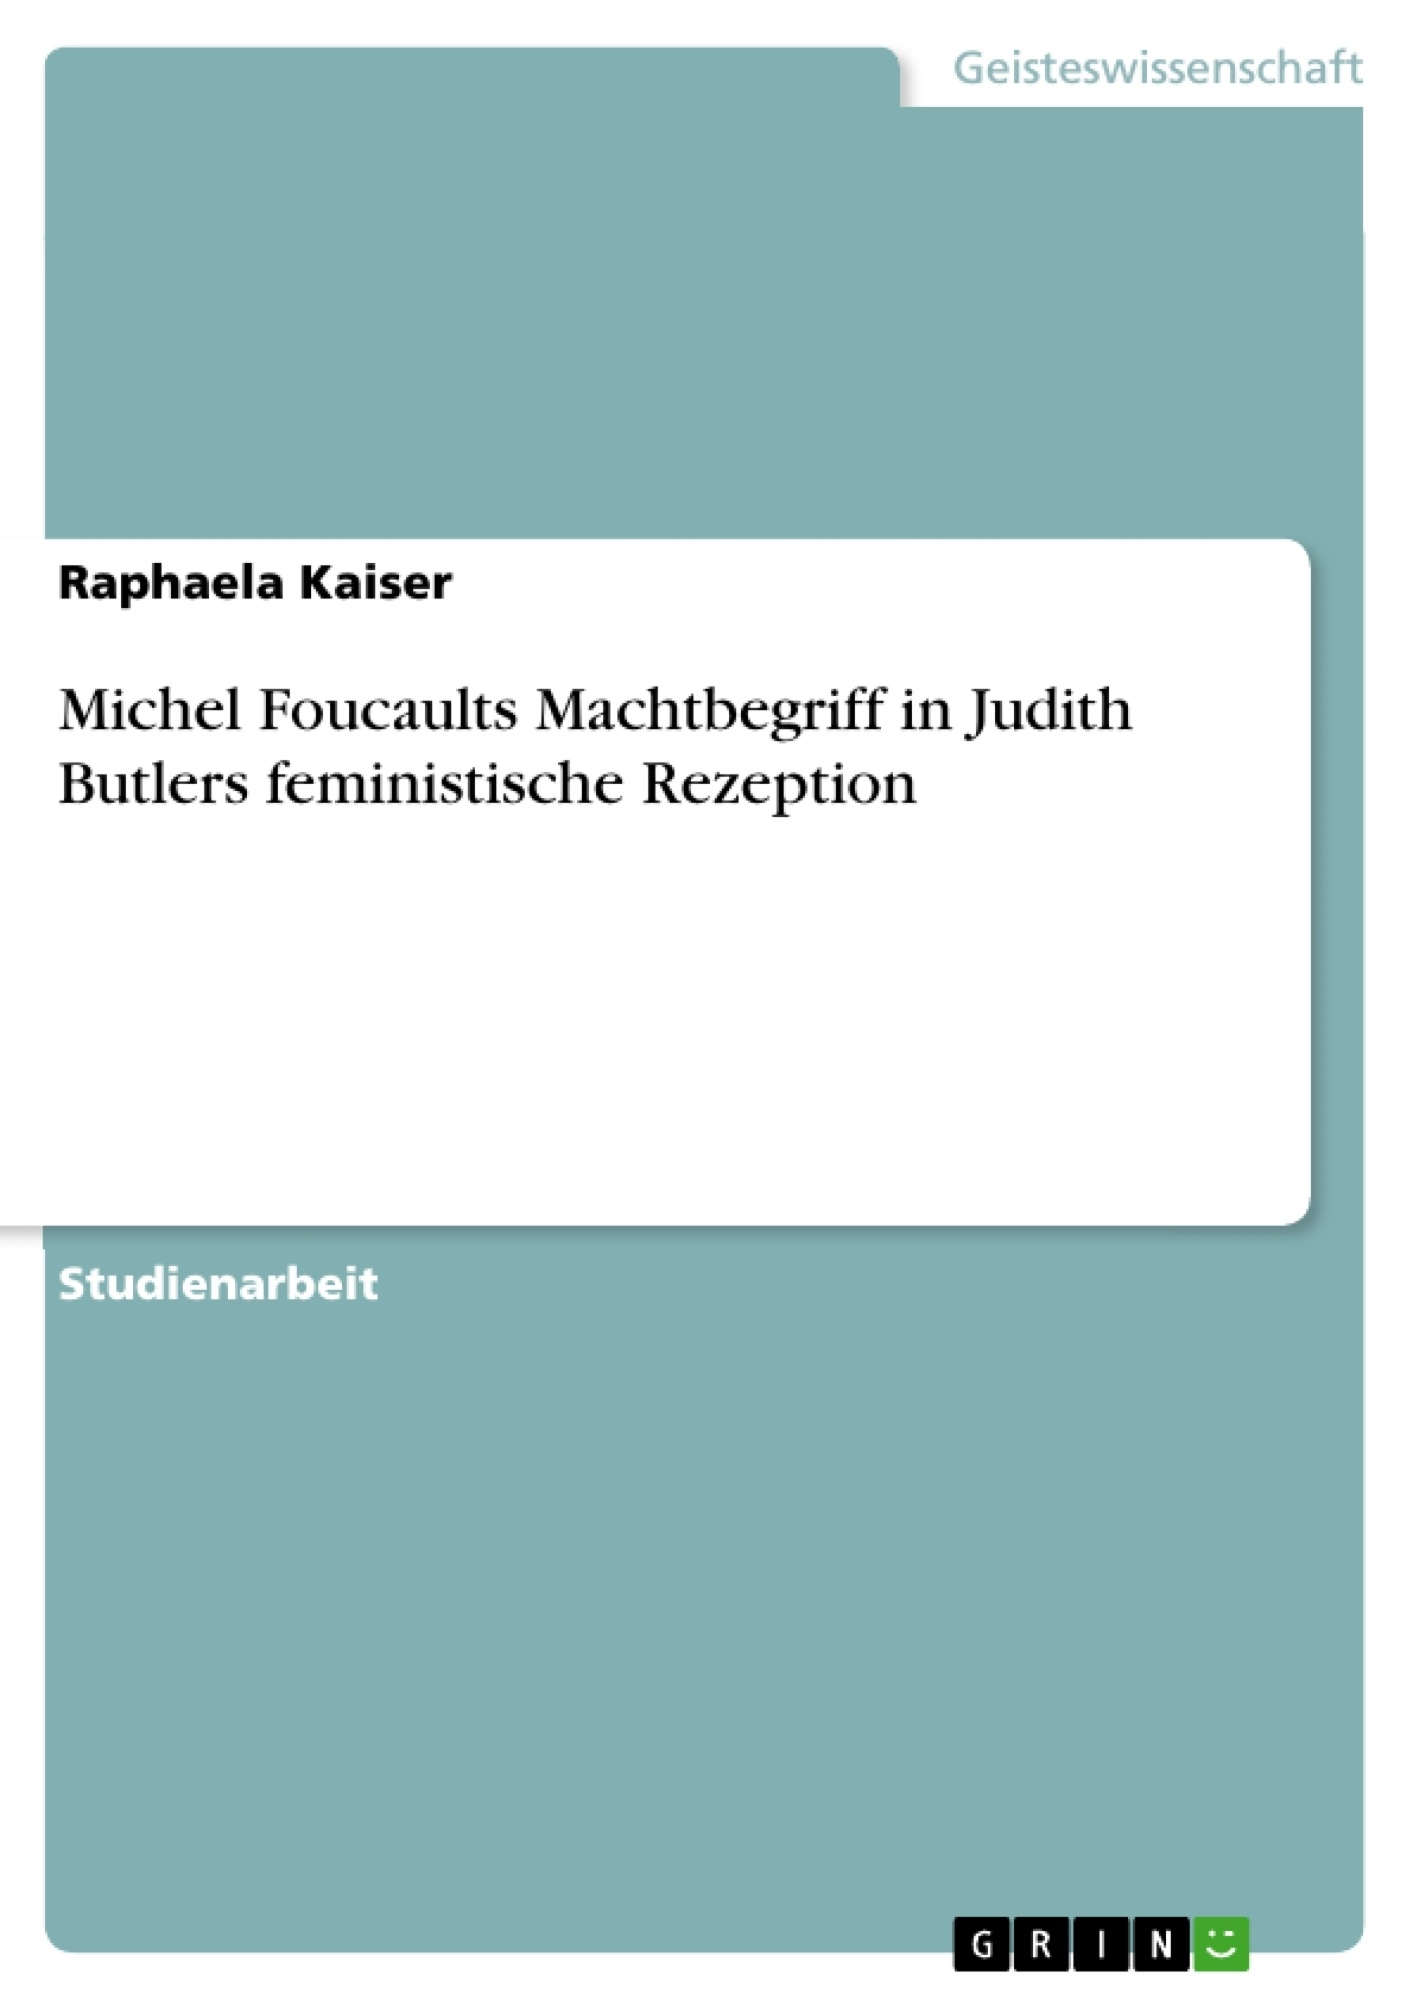 Titel: Michel Foucaults Machtbegriff in Judith Butlers feministische Rezeption